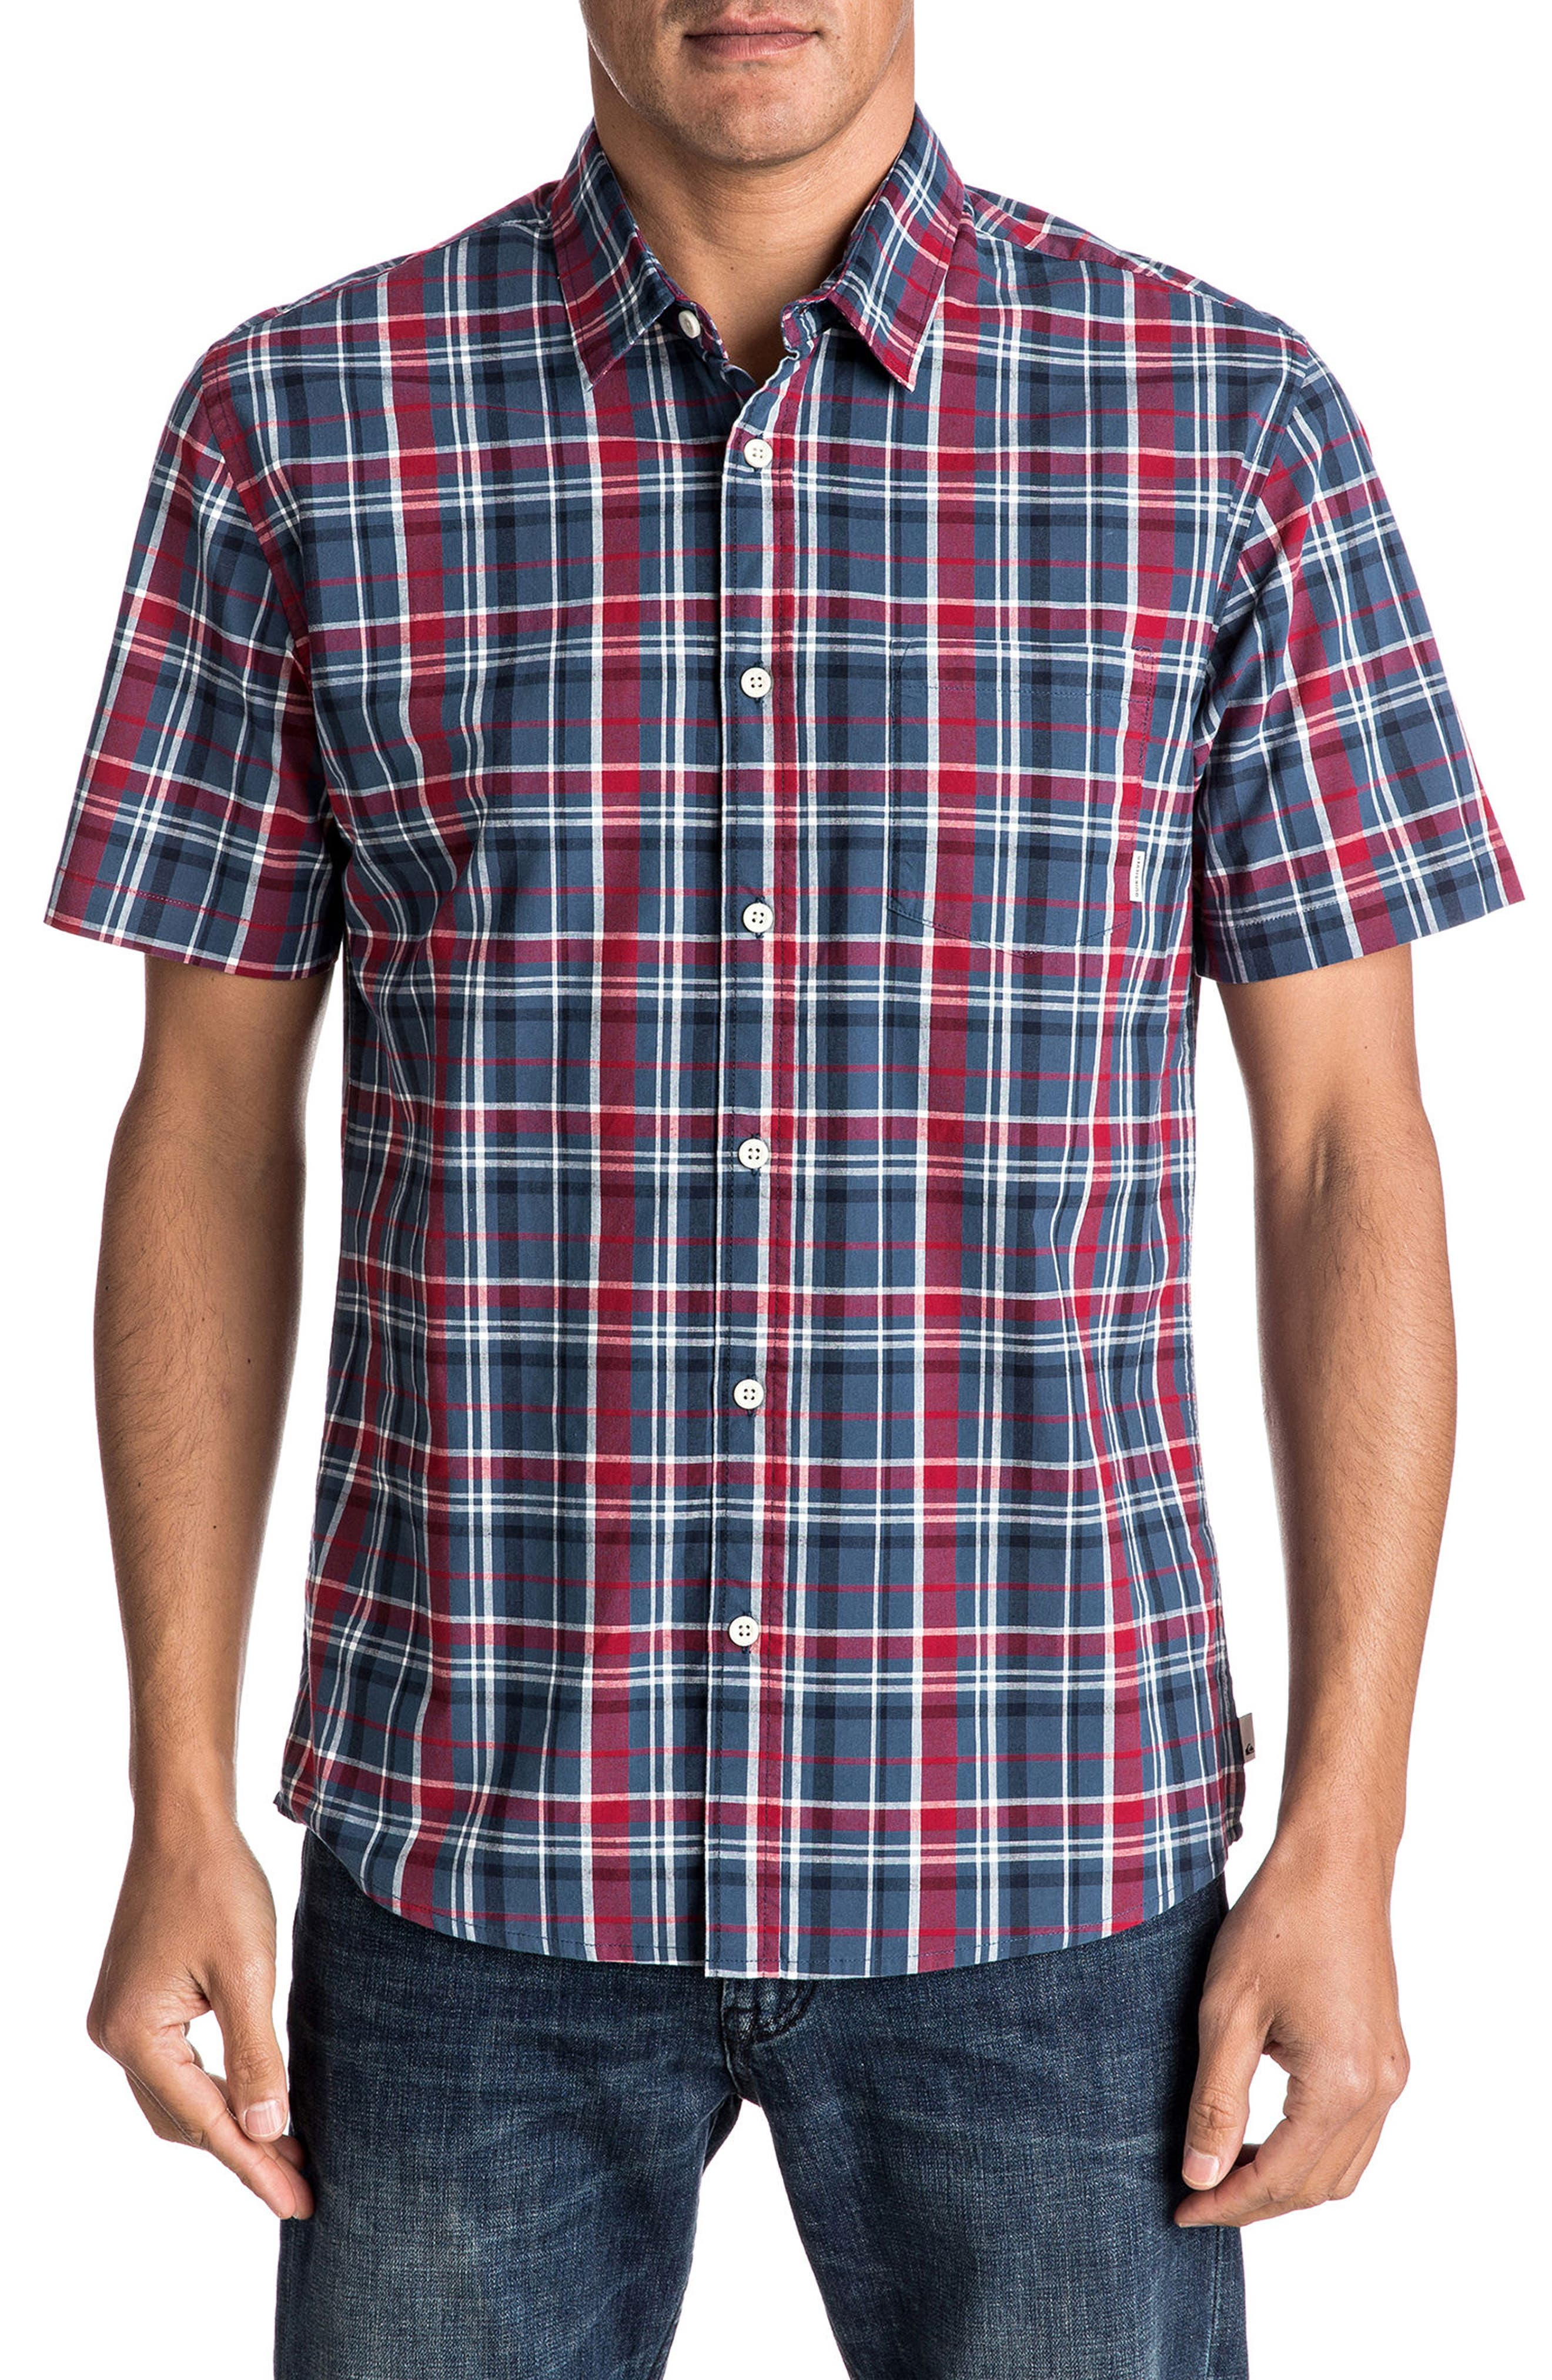 QUIKSILVER Everyday Check Woven Shirt